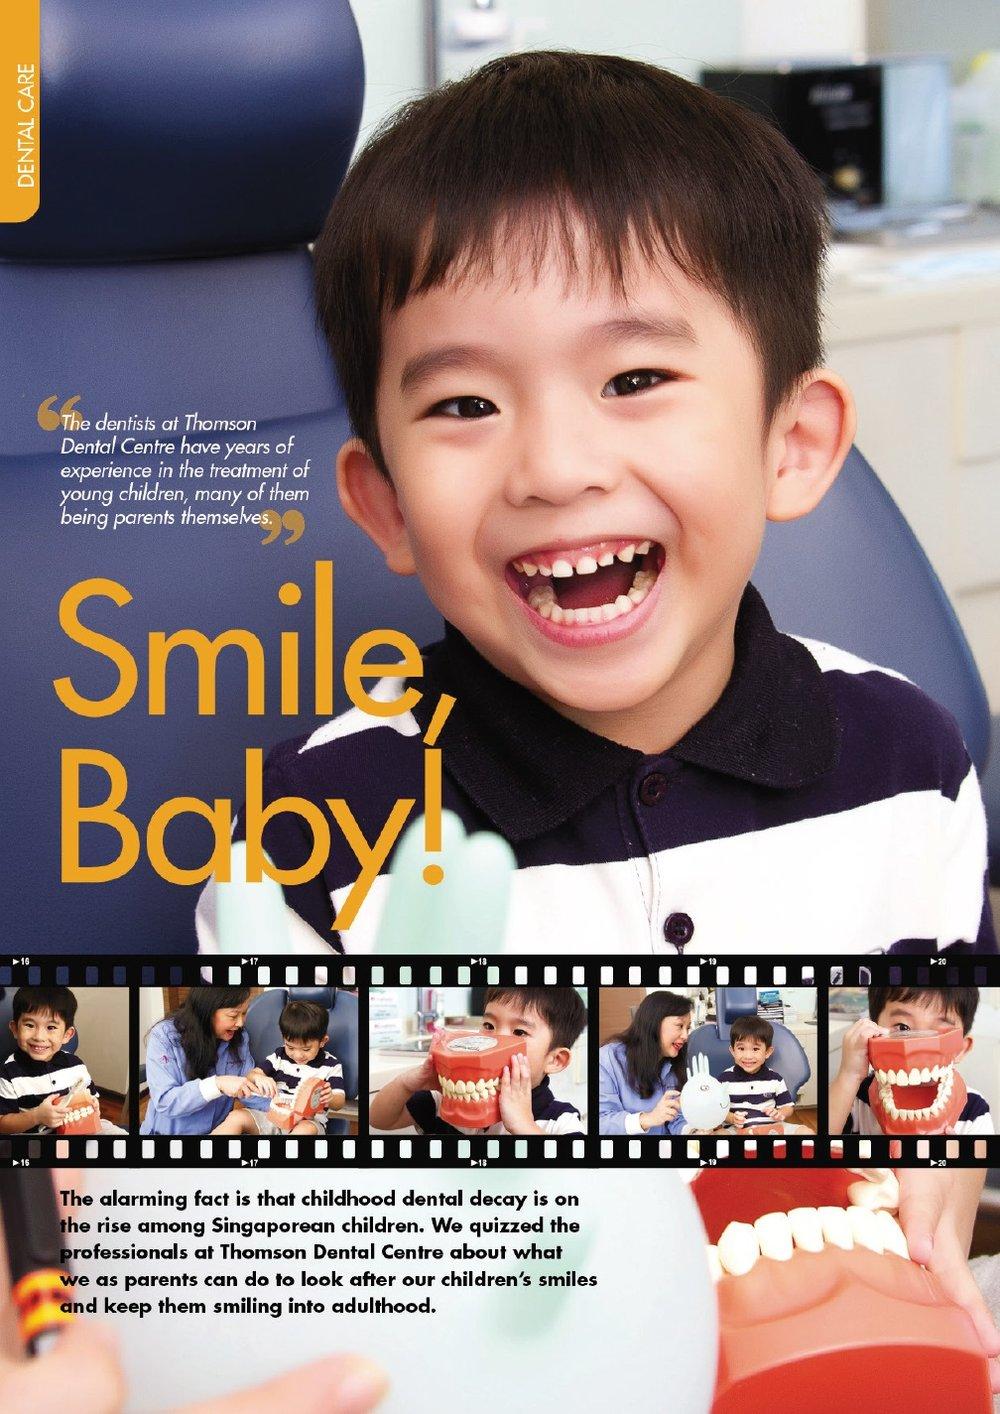 Smile baby.jpg